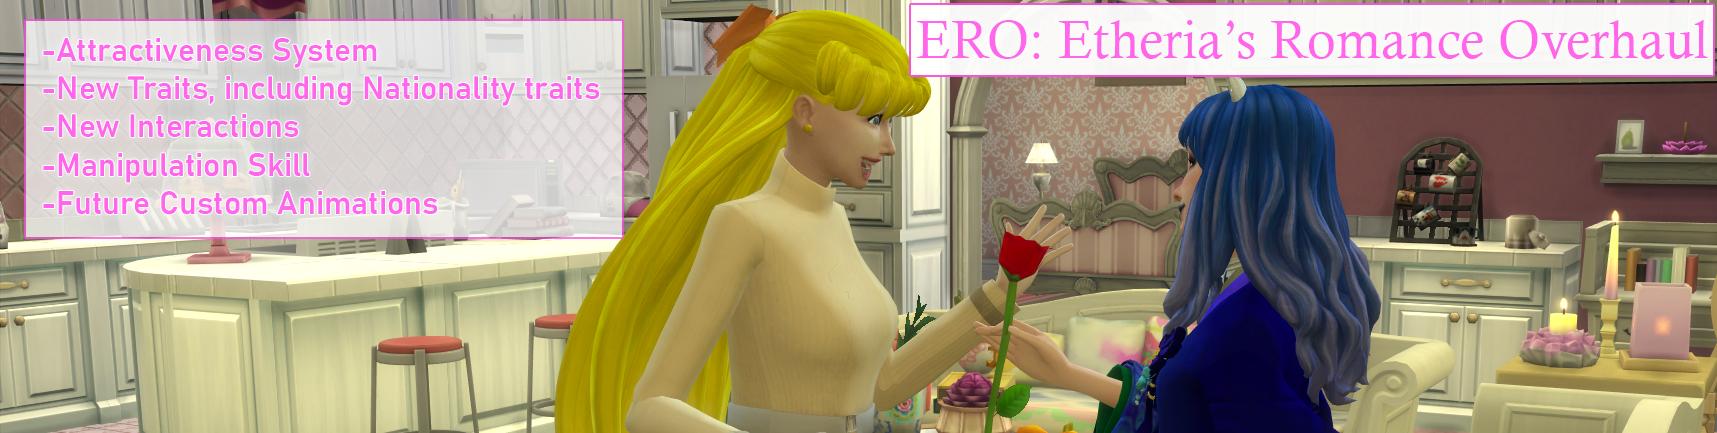 Расширенная система романтики / Etheria's Romance Overhaul 3.2 (16.12.2020)